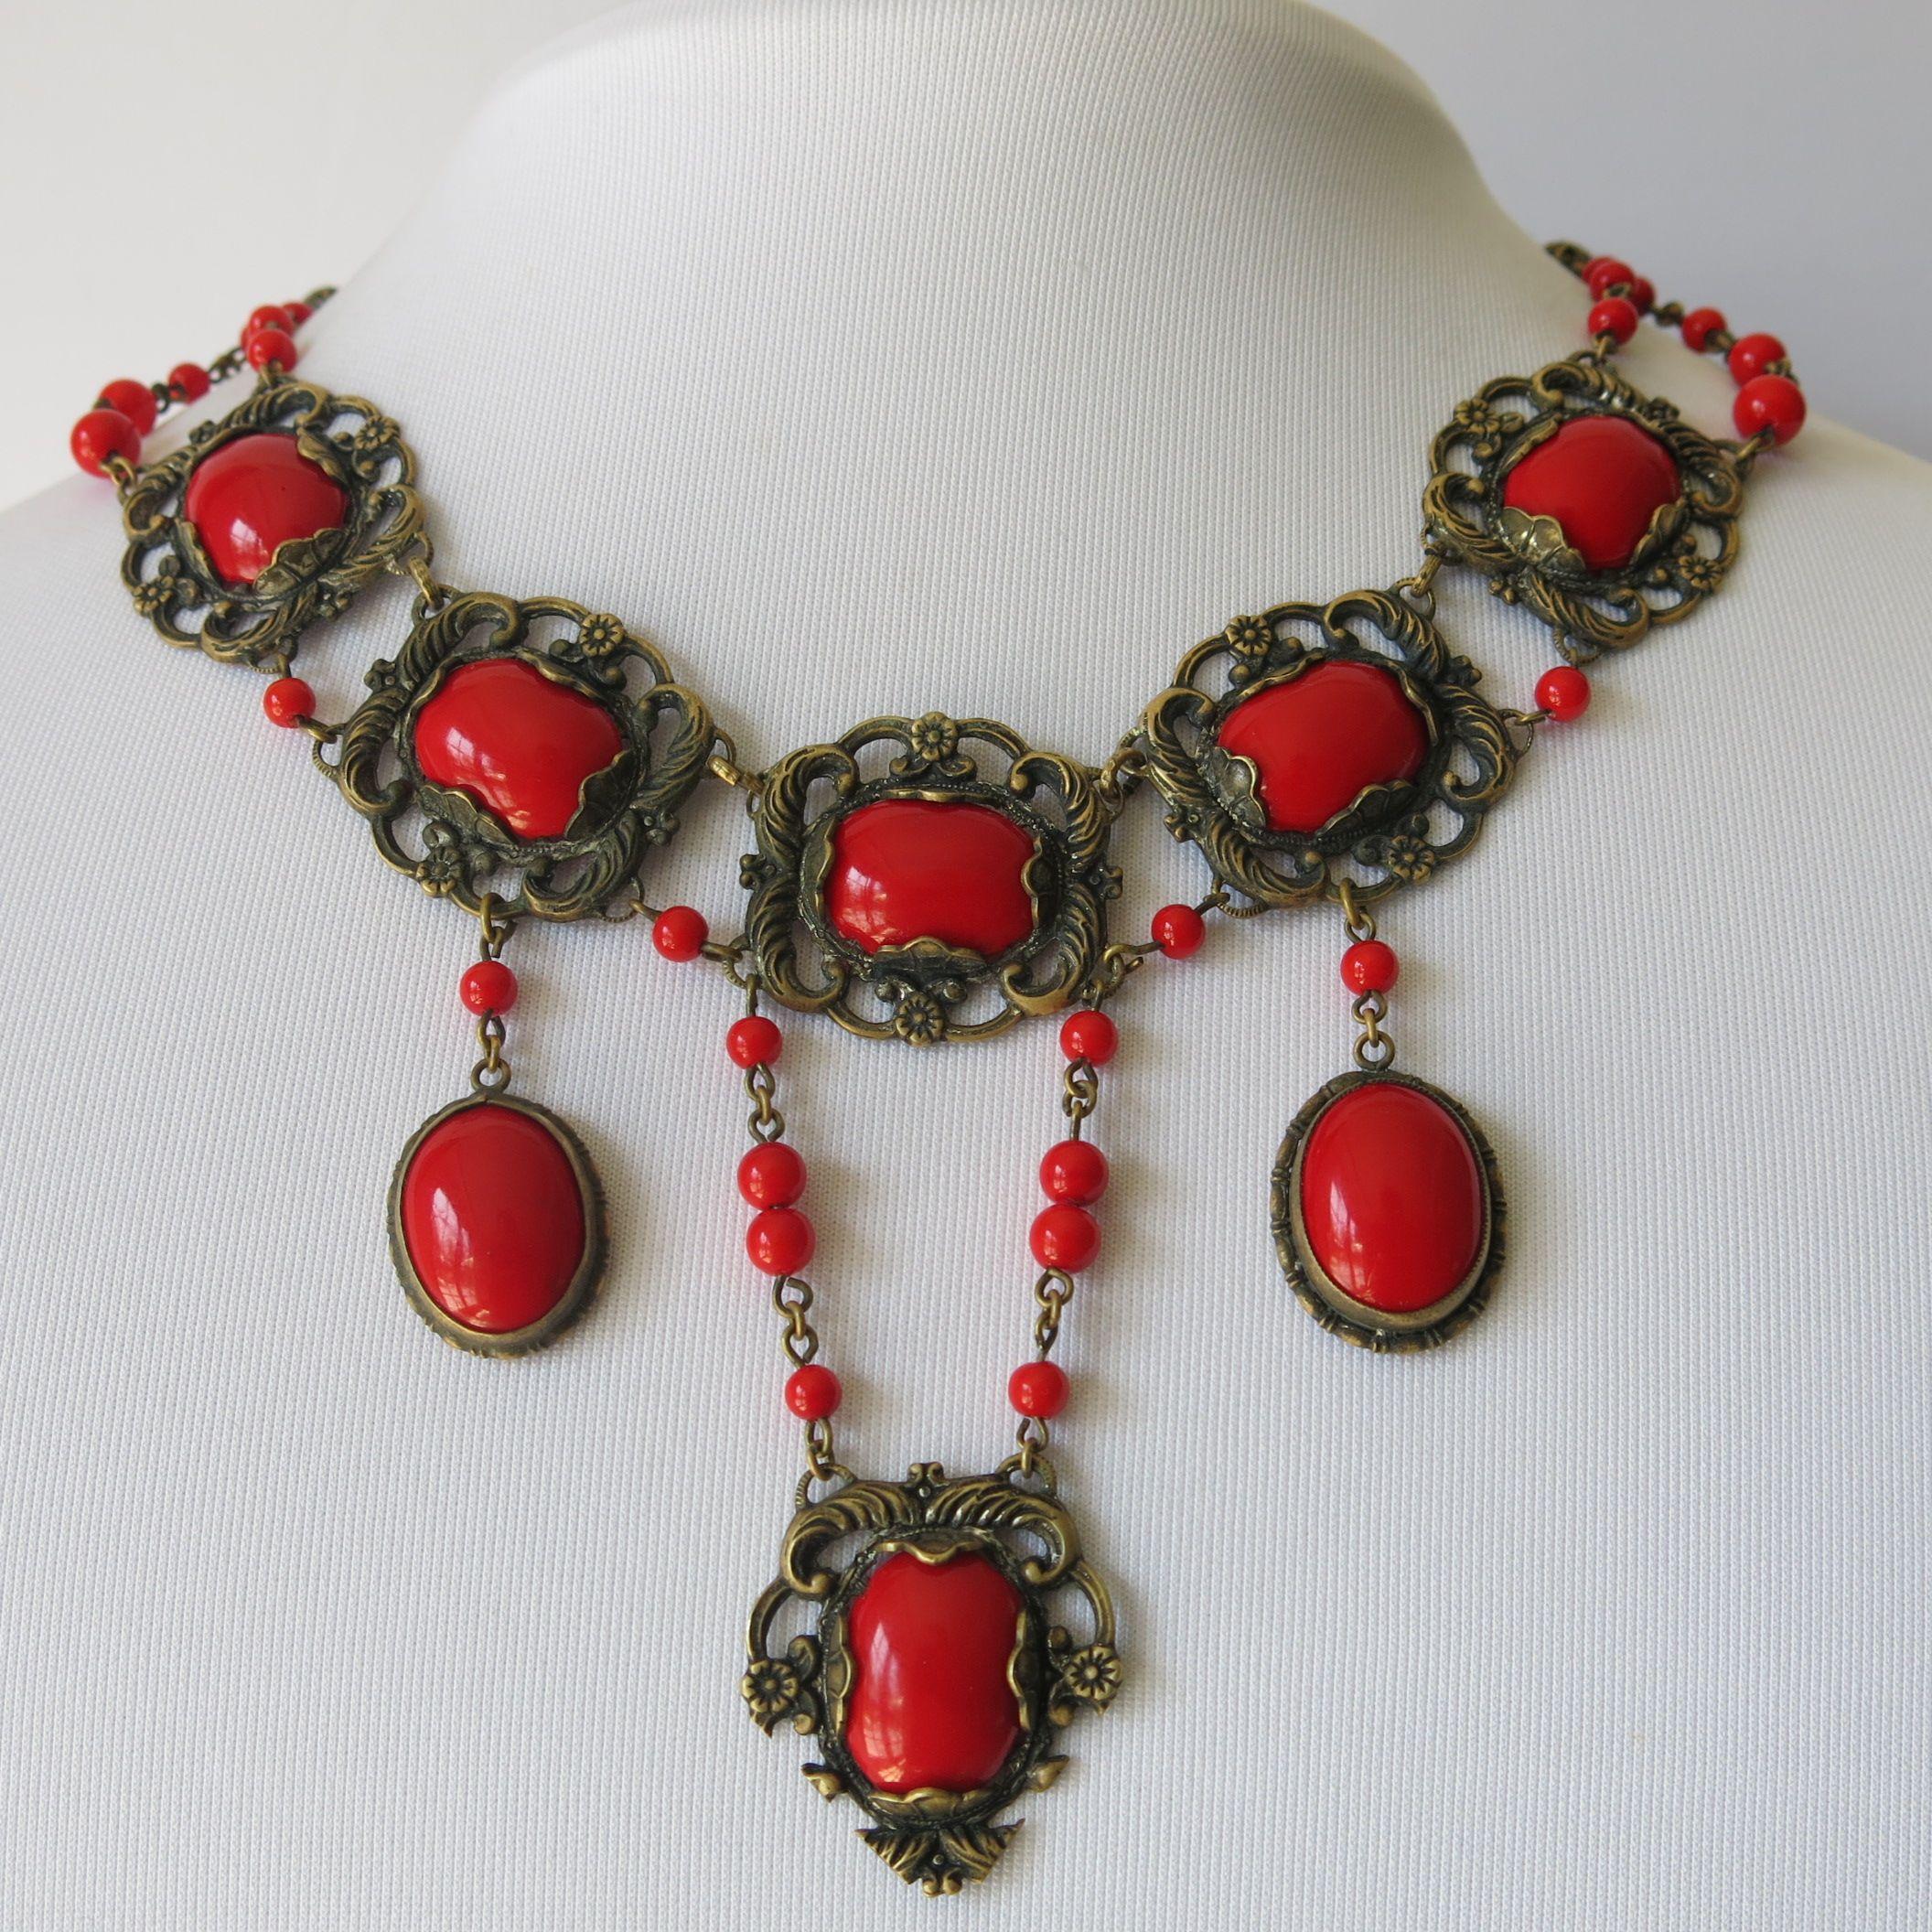 Boho Bohemian Baroque Ruby Red Glass Vintage Style Vintage Black Czech Glass Nouveau Art Deco Style Necklace